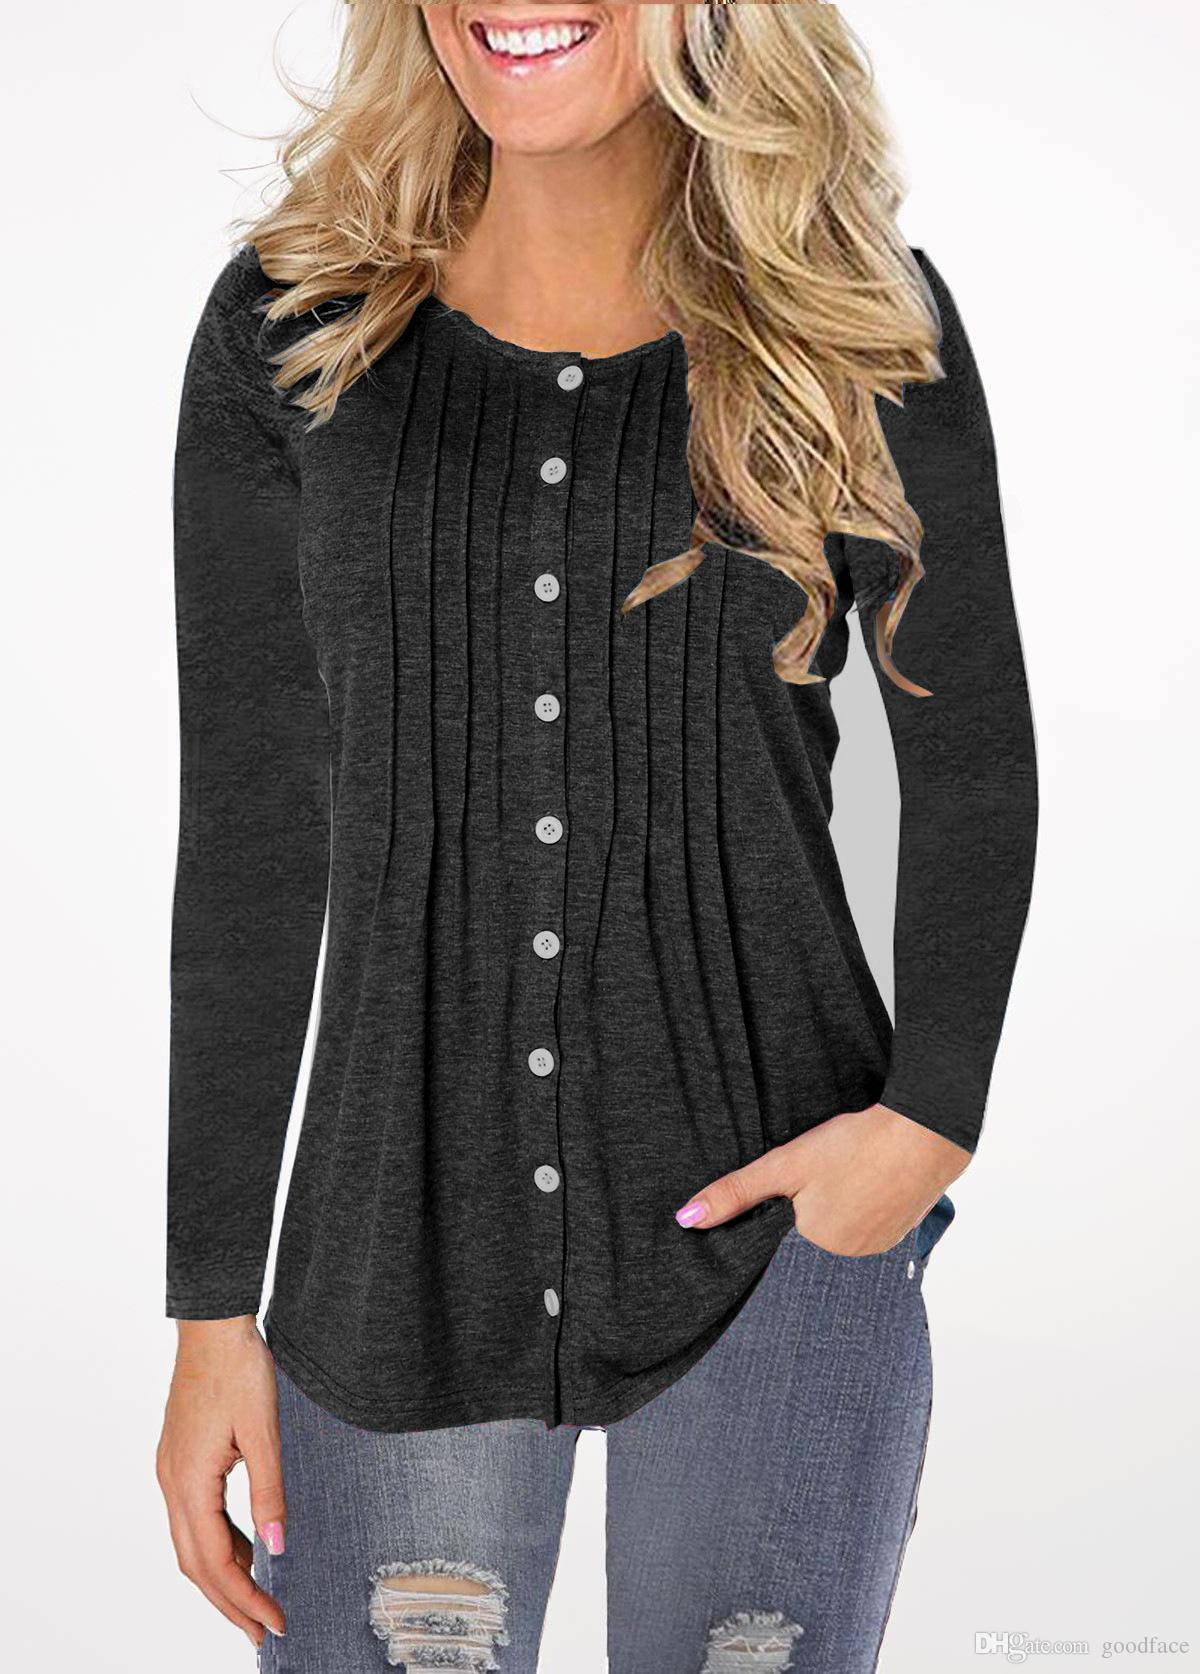 Blusas arco-íris Gradiente Mulheres Fold coloridas Tops Imprimir Moda Sweater soltas Casual Shirt Pullover Blusa Tees Plus Size por goodface